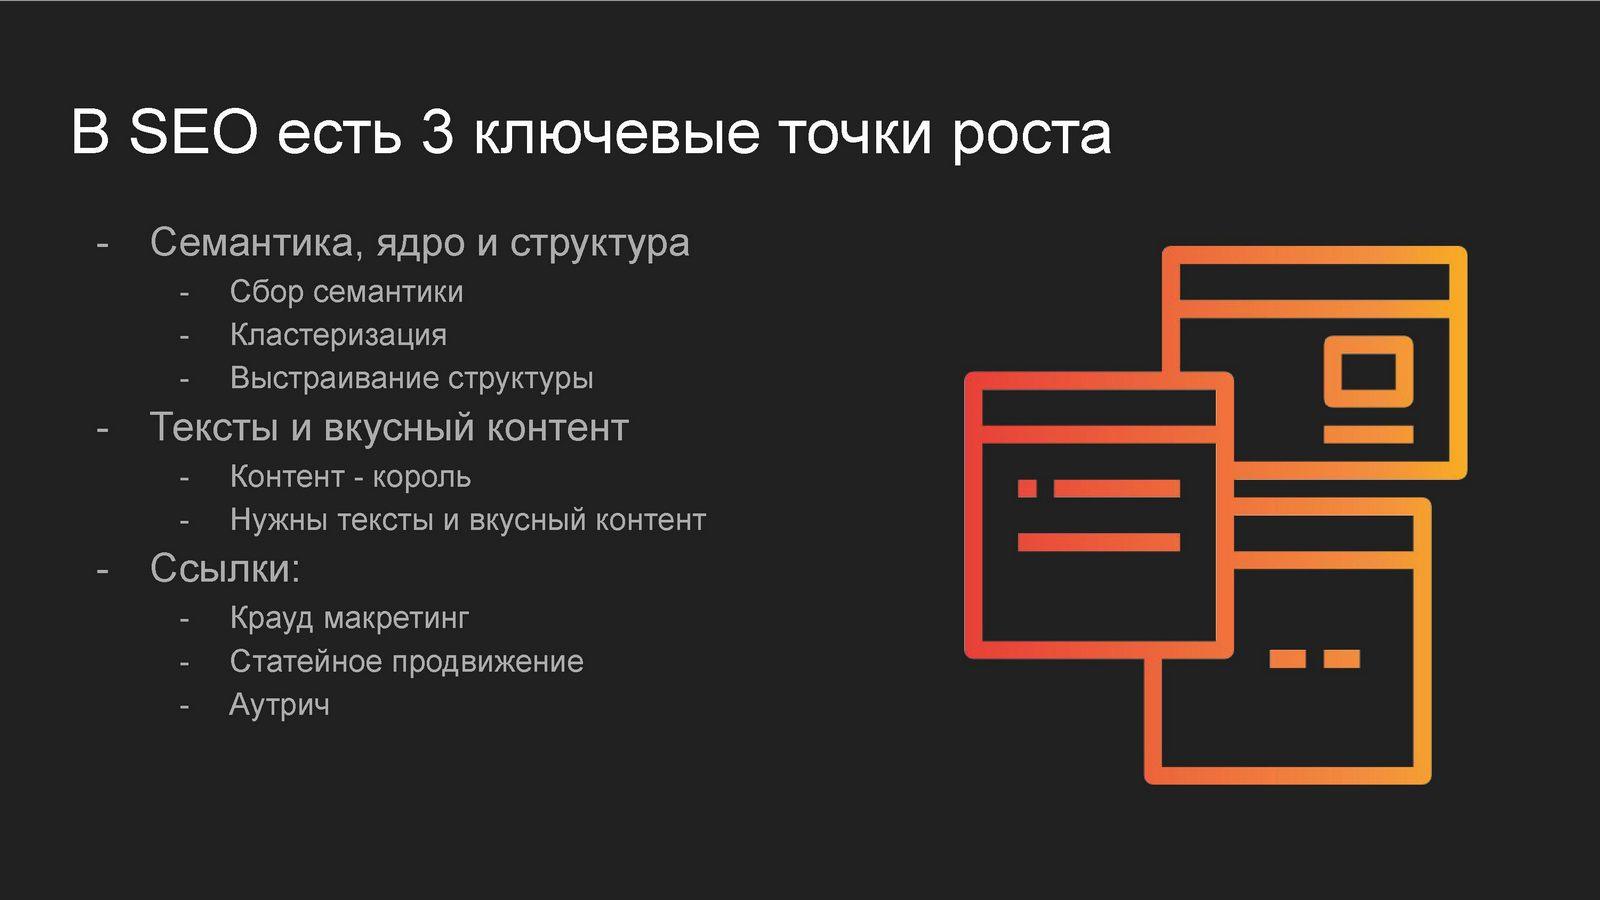 wp10-Анатолий Юмашев-Агрегатор bizzapps.ru 07